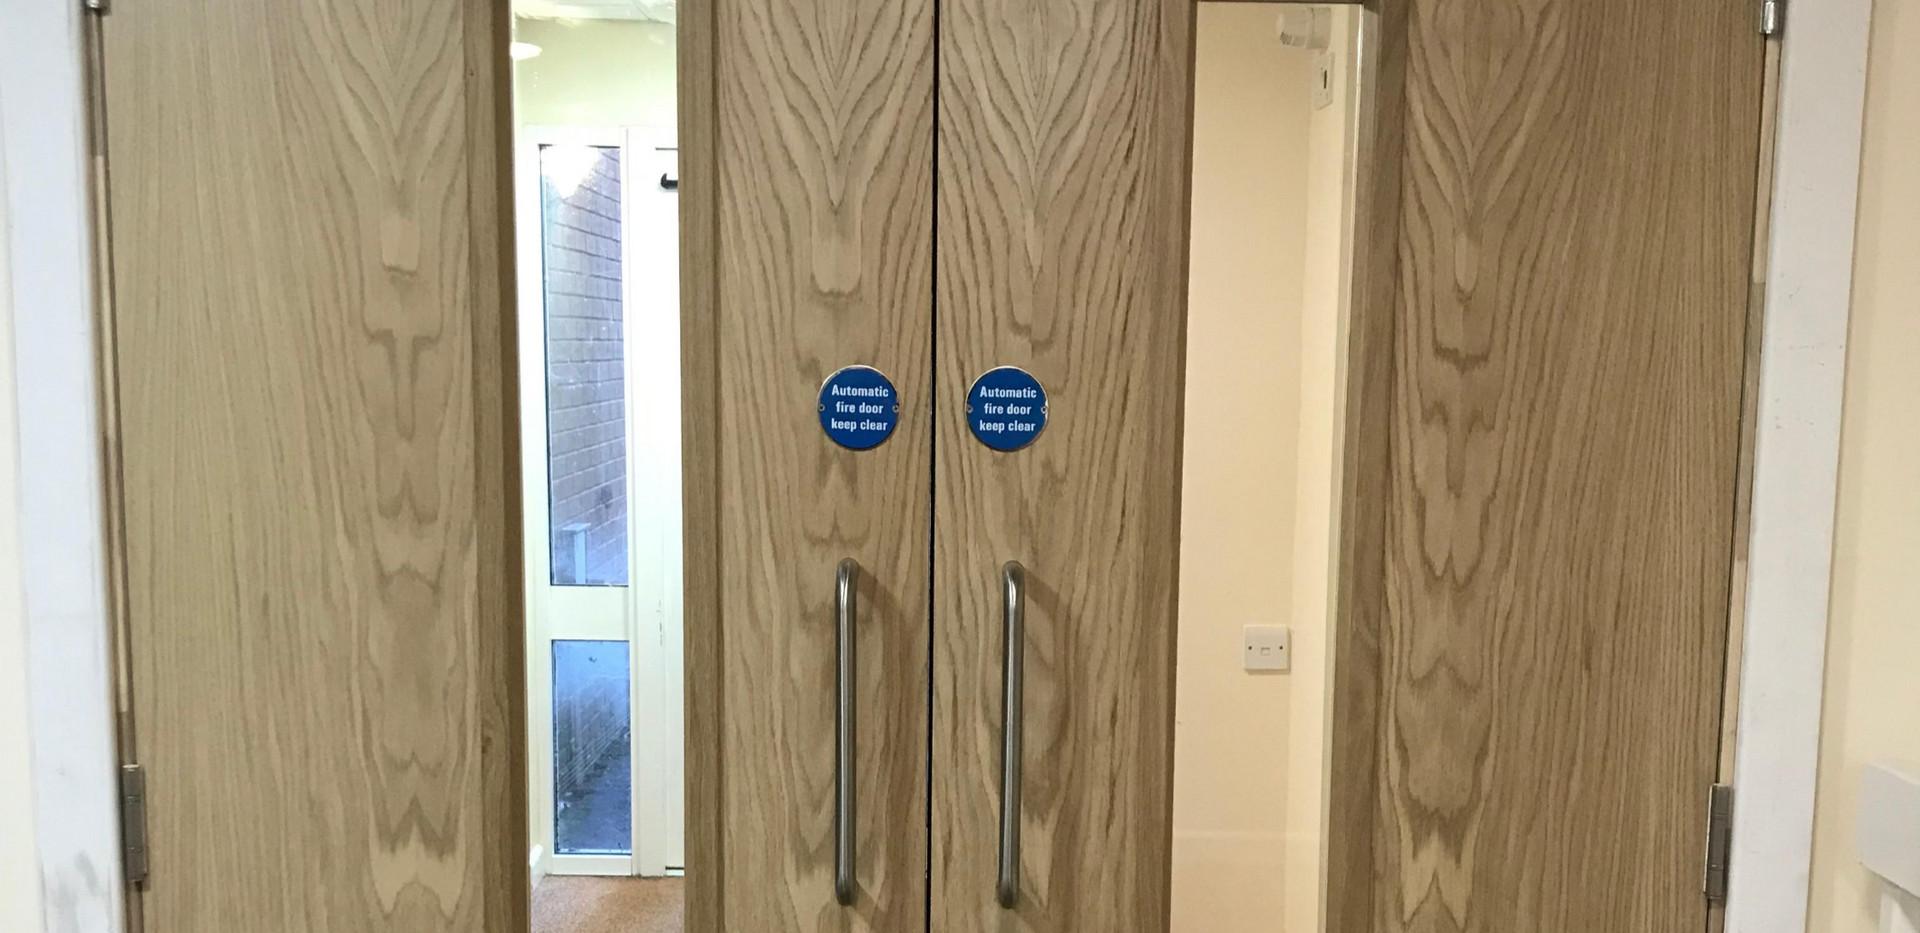 FD30 Oak doors with windows and ironmongery